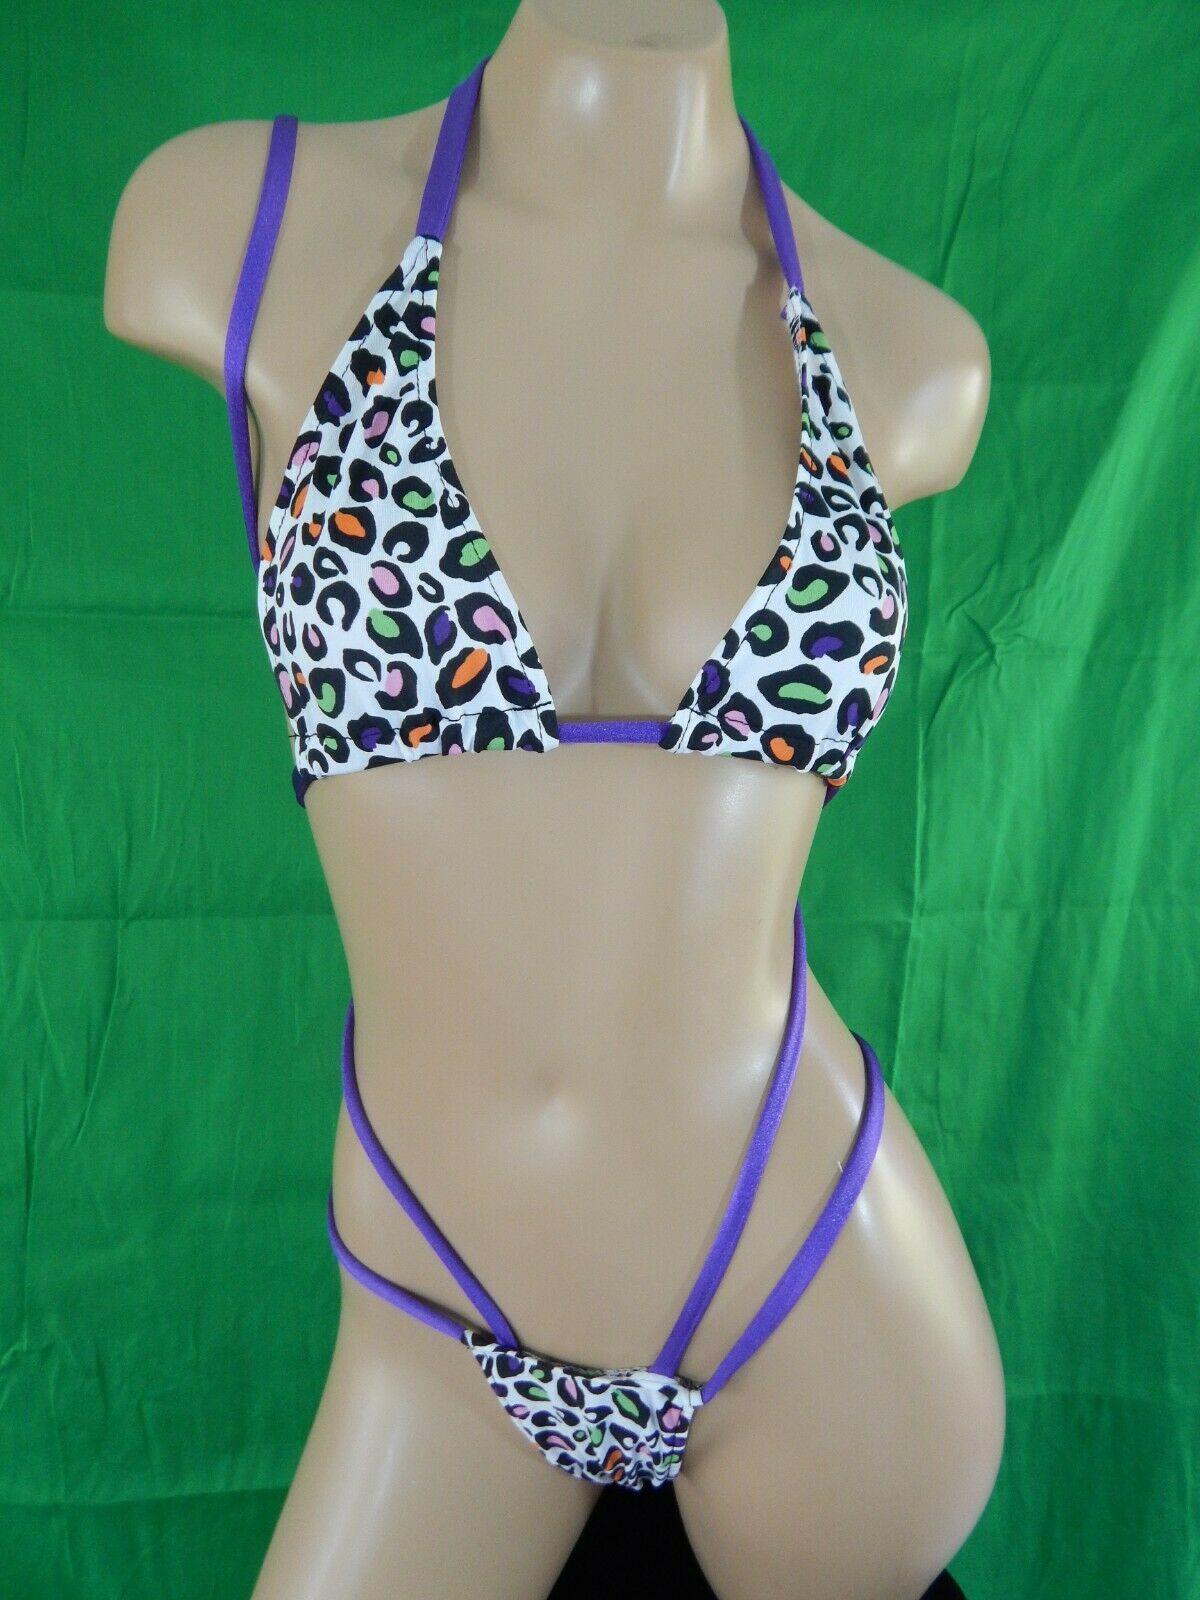 Zombikinis 2 piece exotic dancer stripper set  multi color sequins